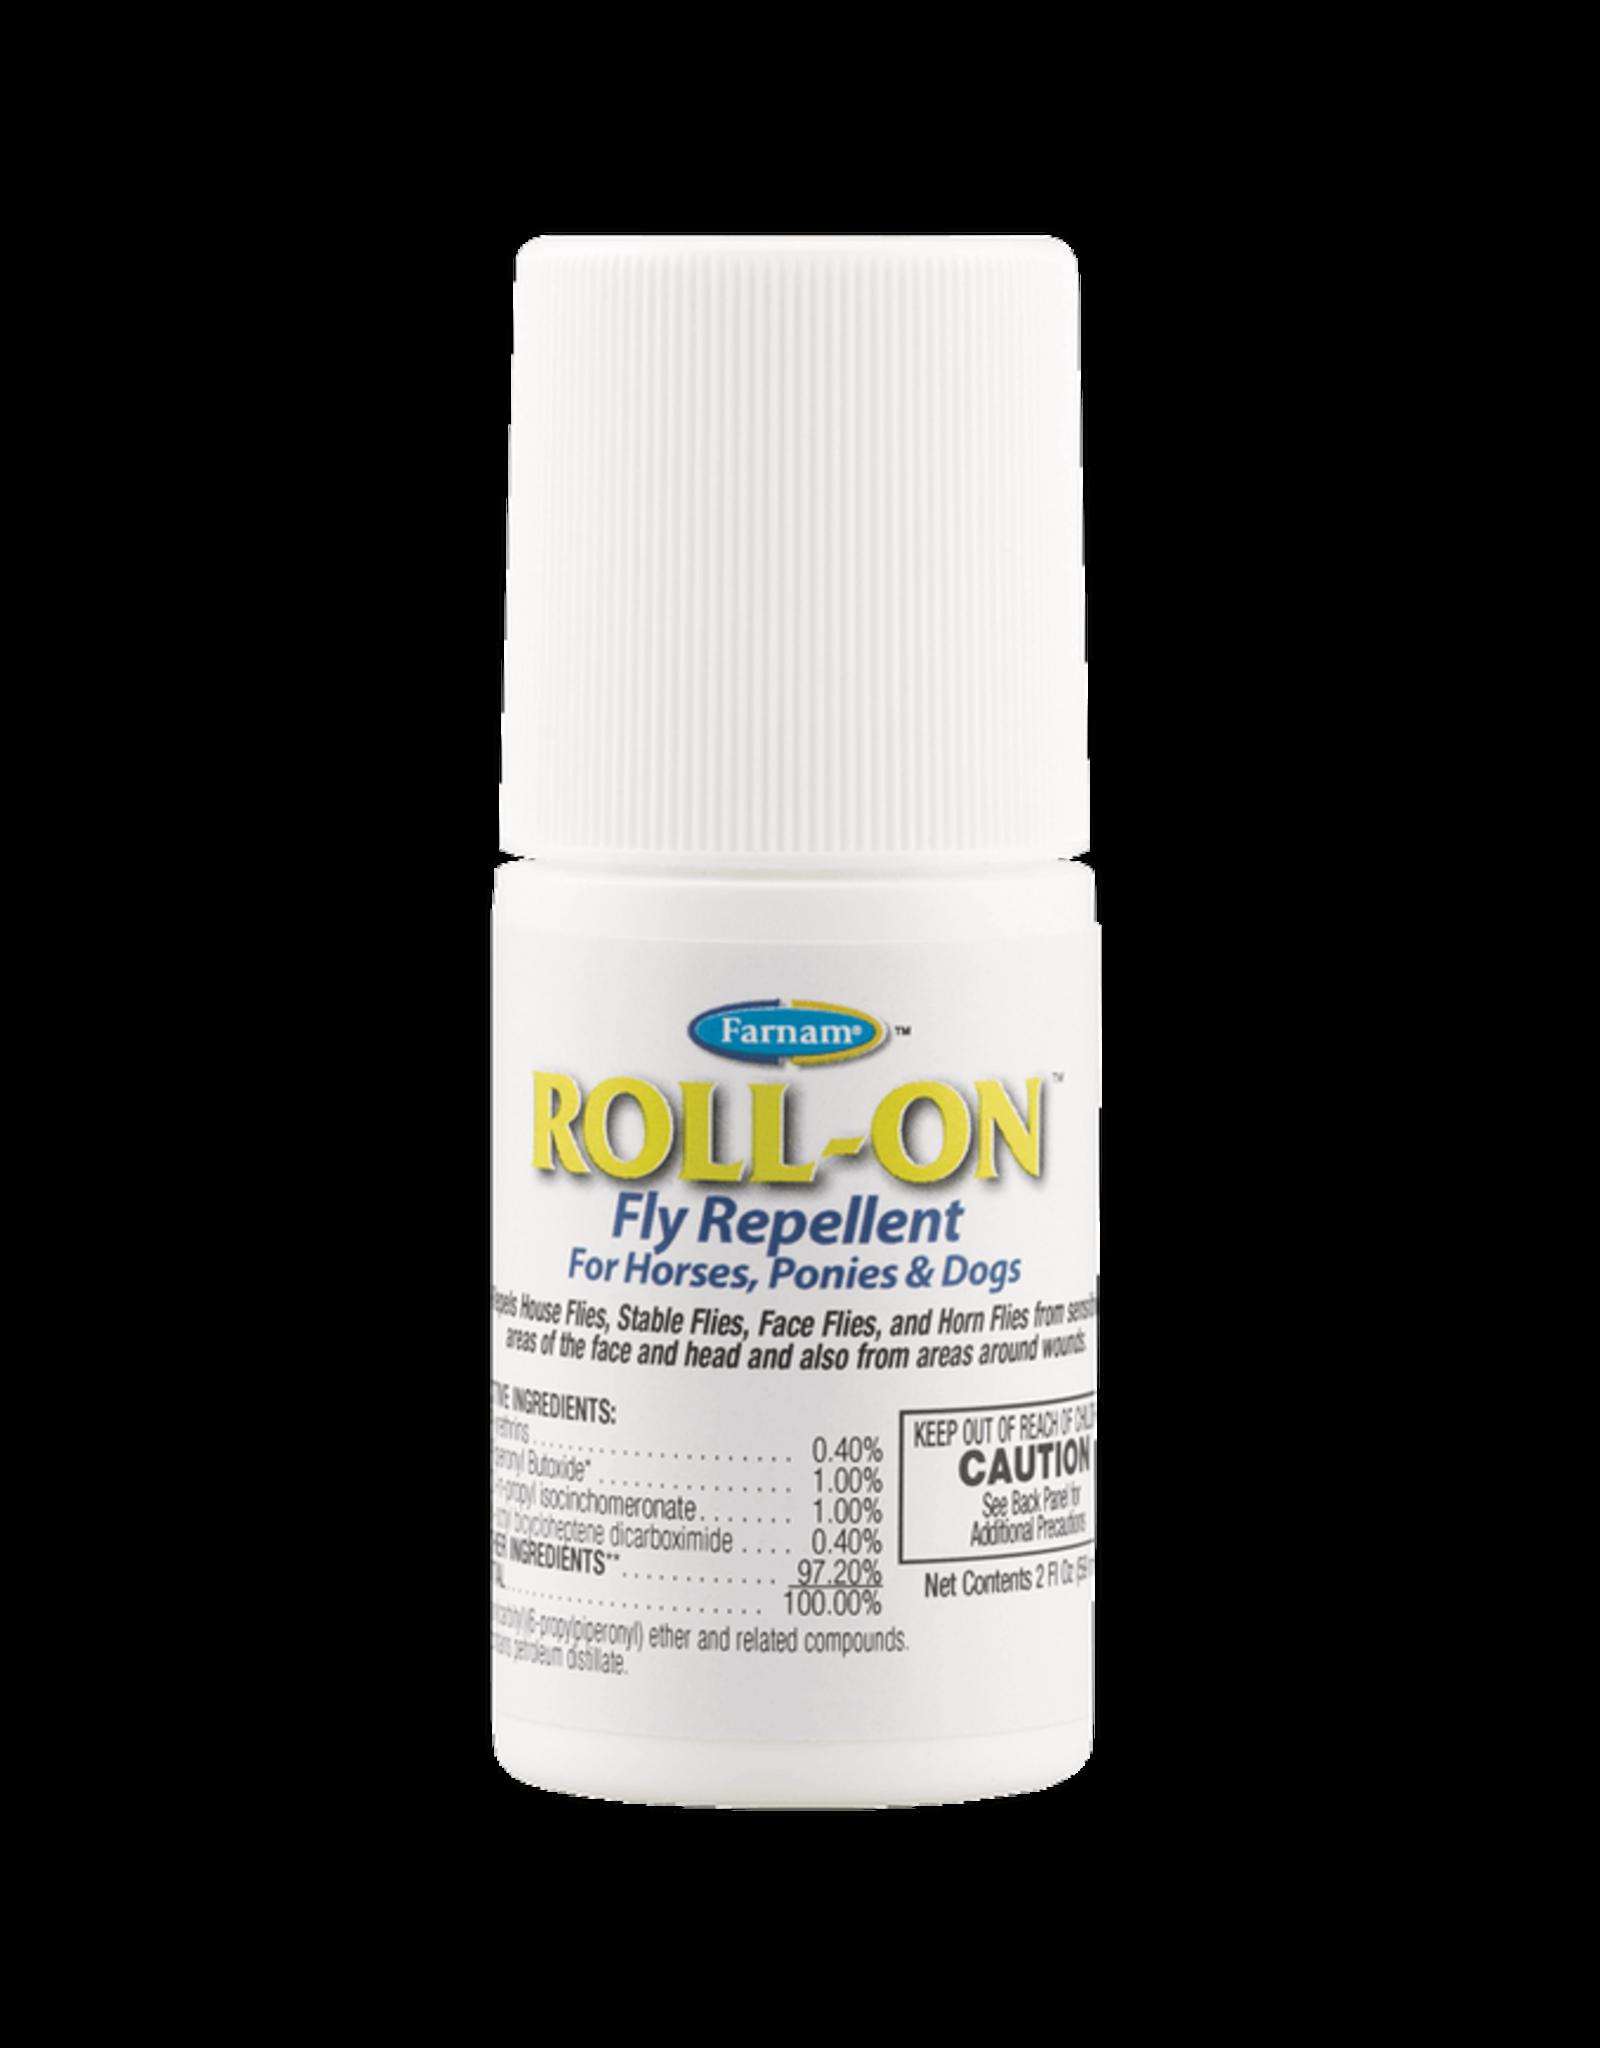 Farnam Roll-On Fly Repellent - 2oz